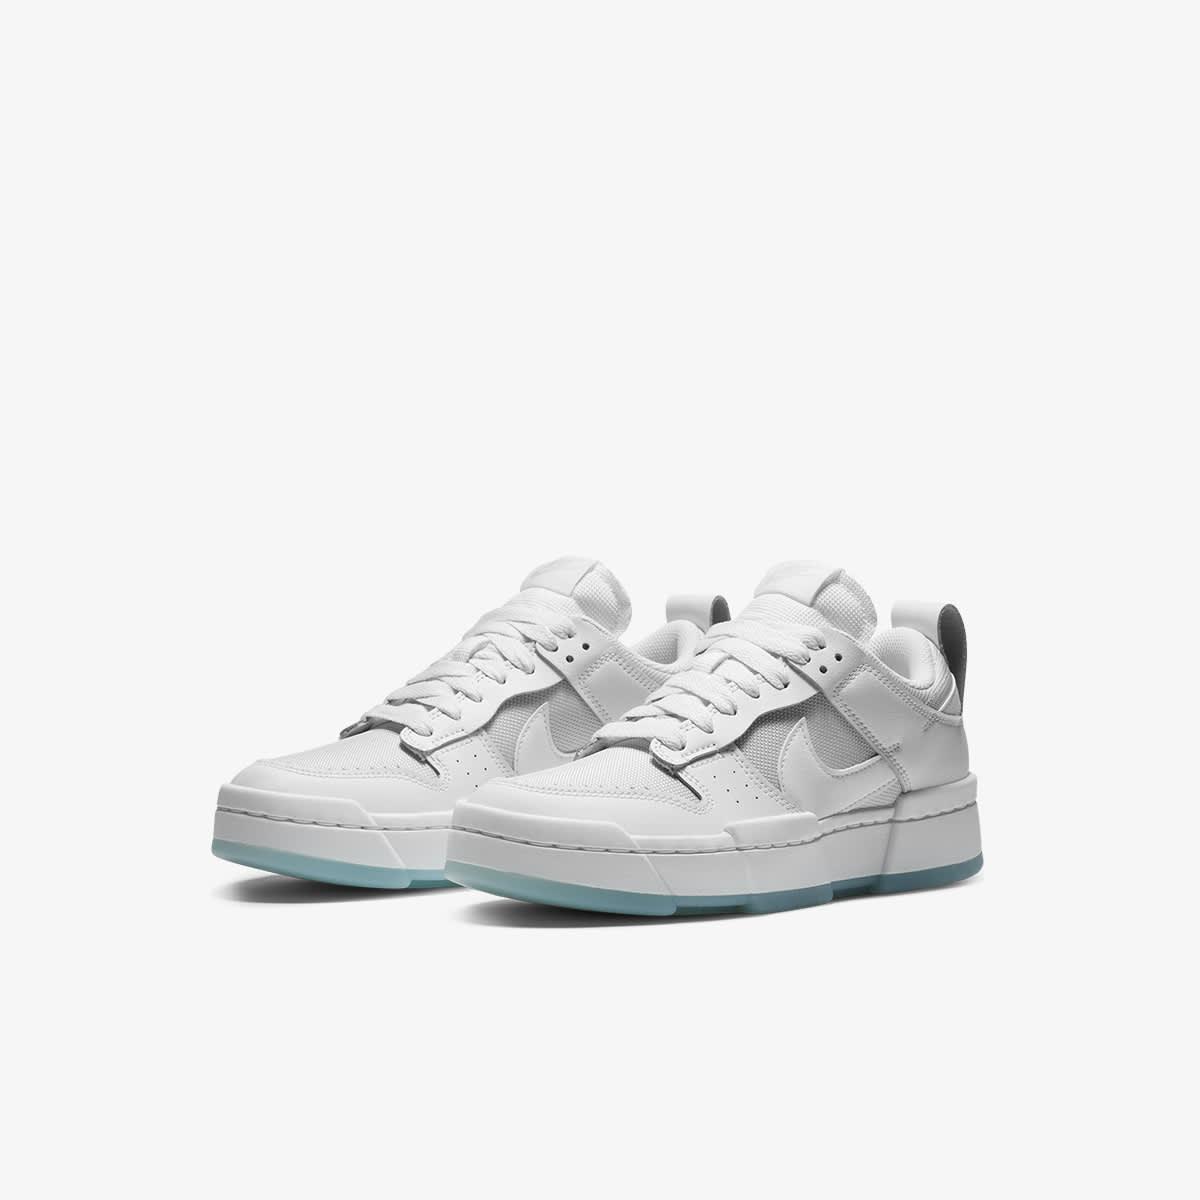 Nike Dunk Disrupt W - CK6654-001